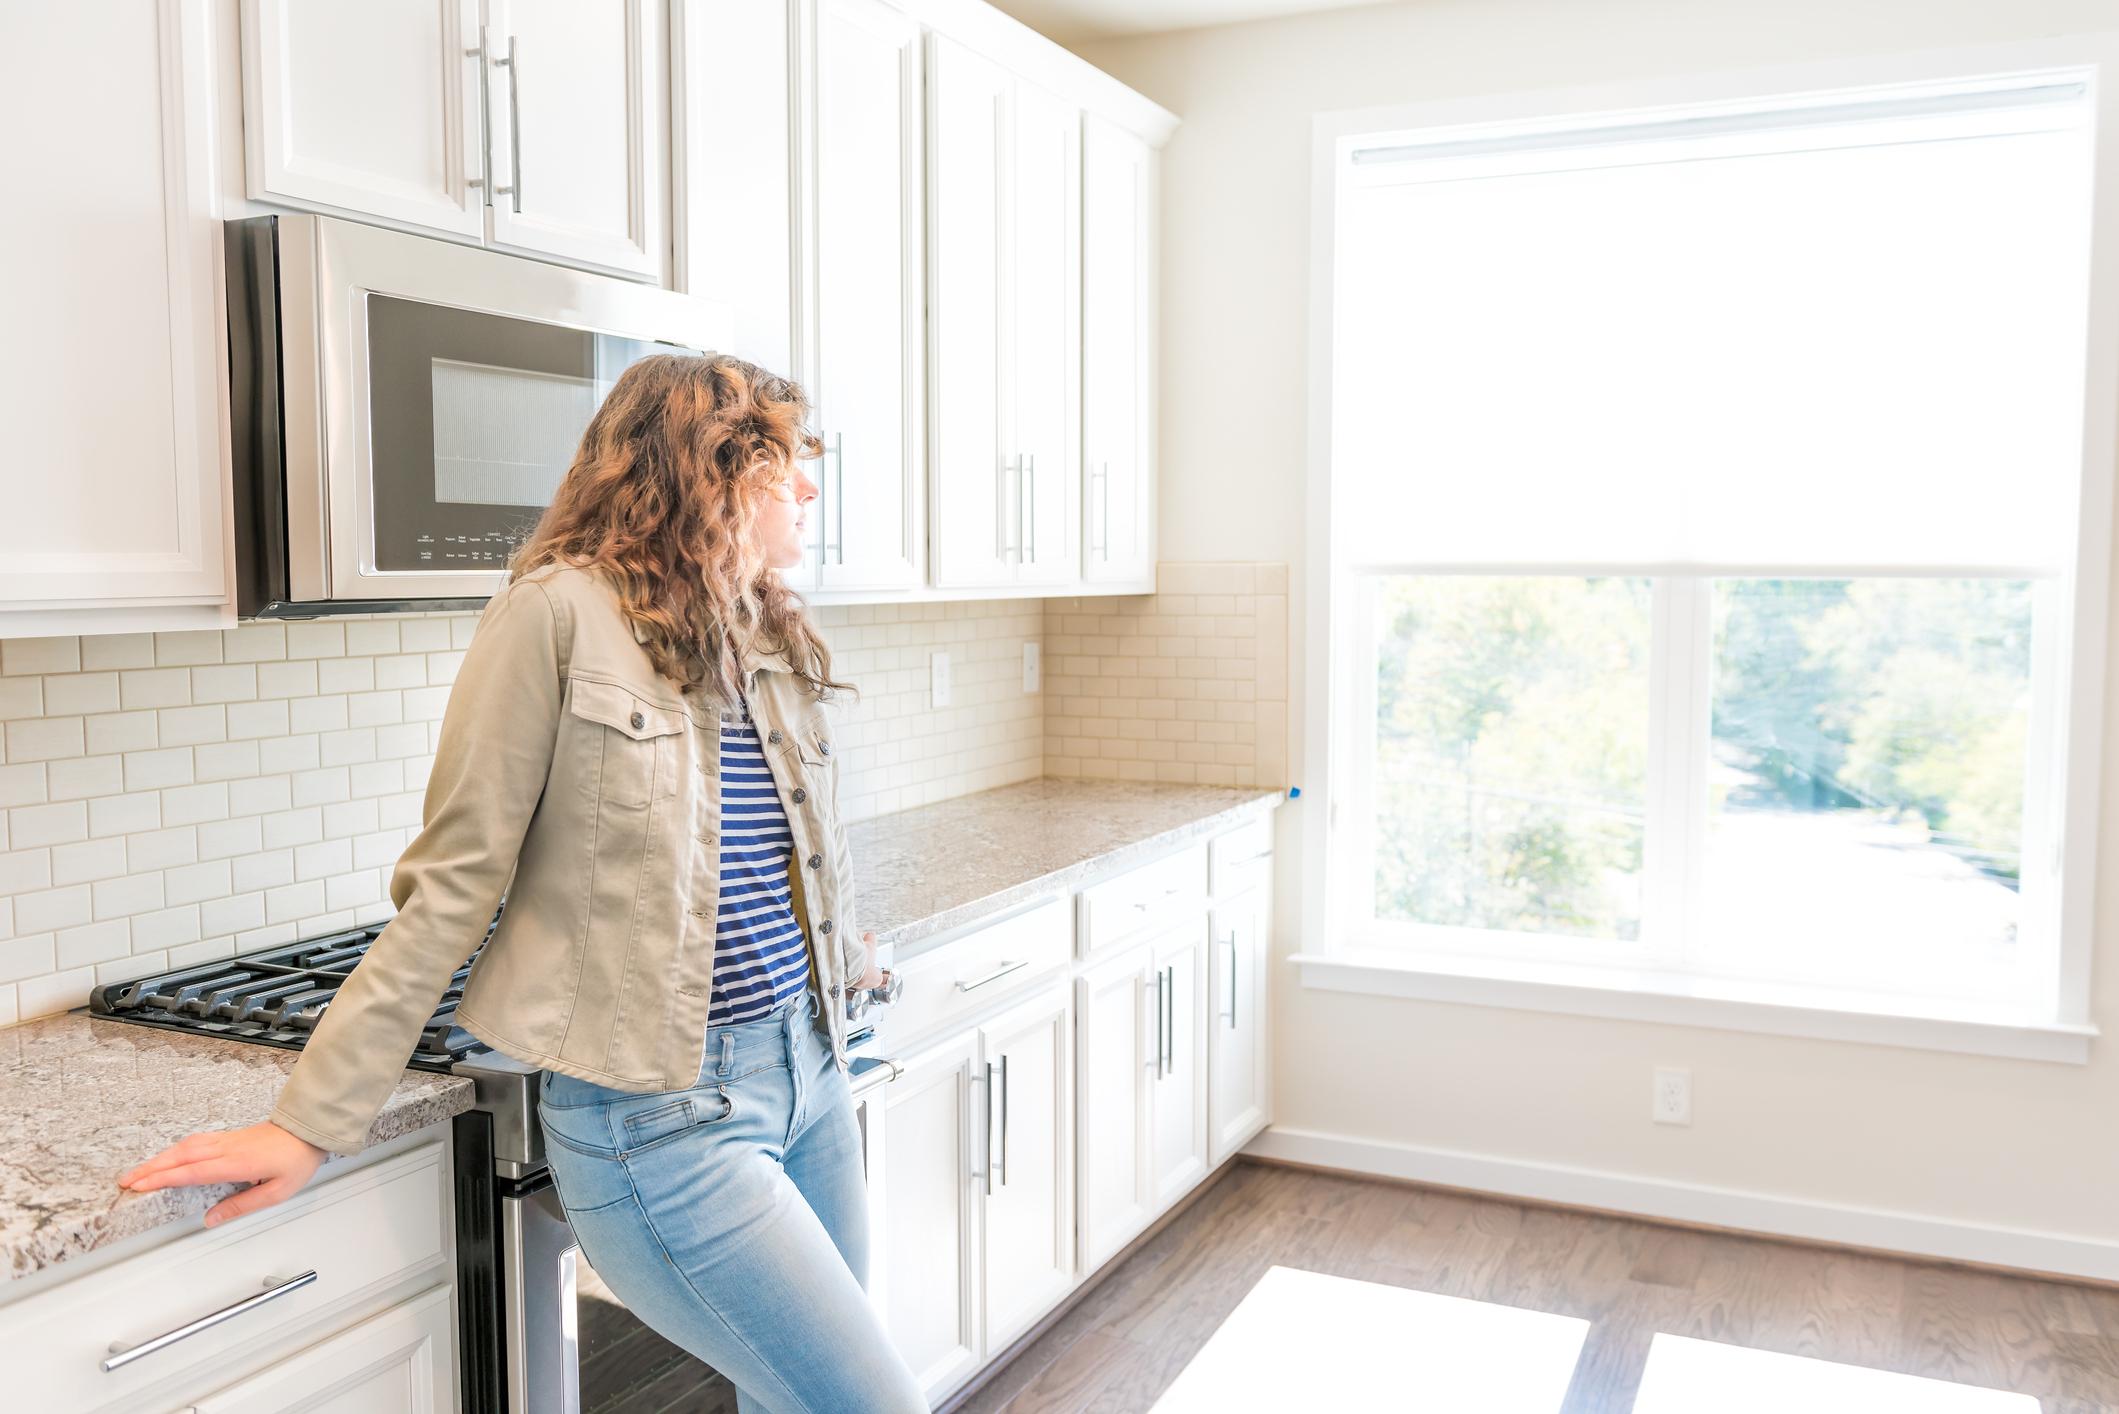 Homebuying Tips for: Single Buyers